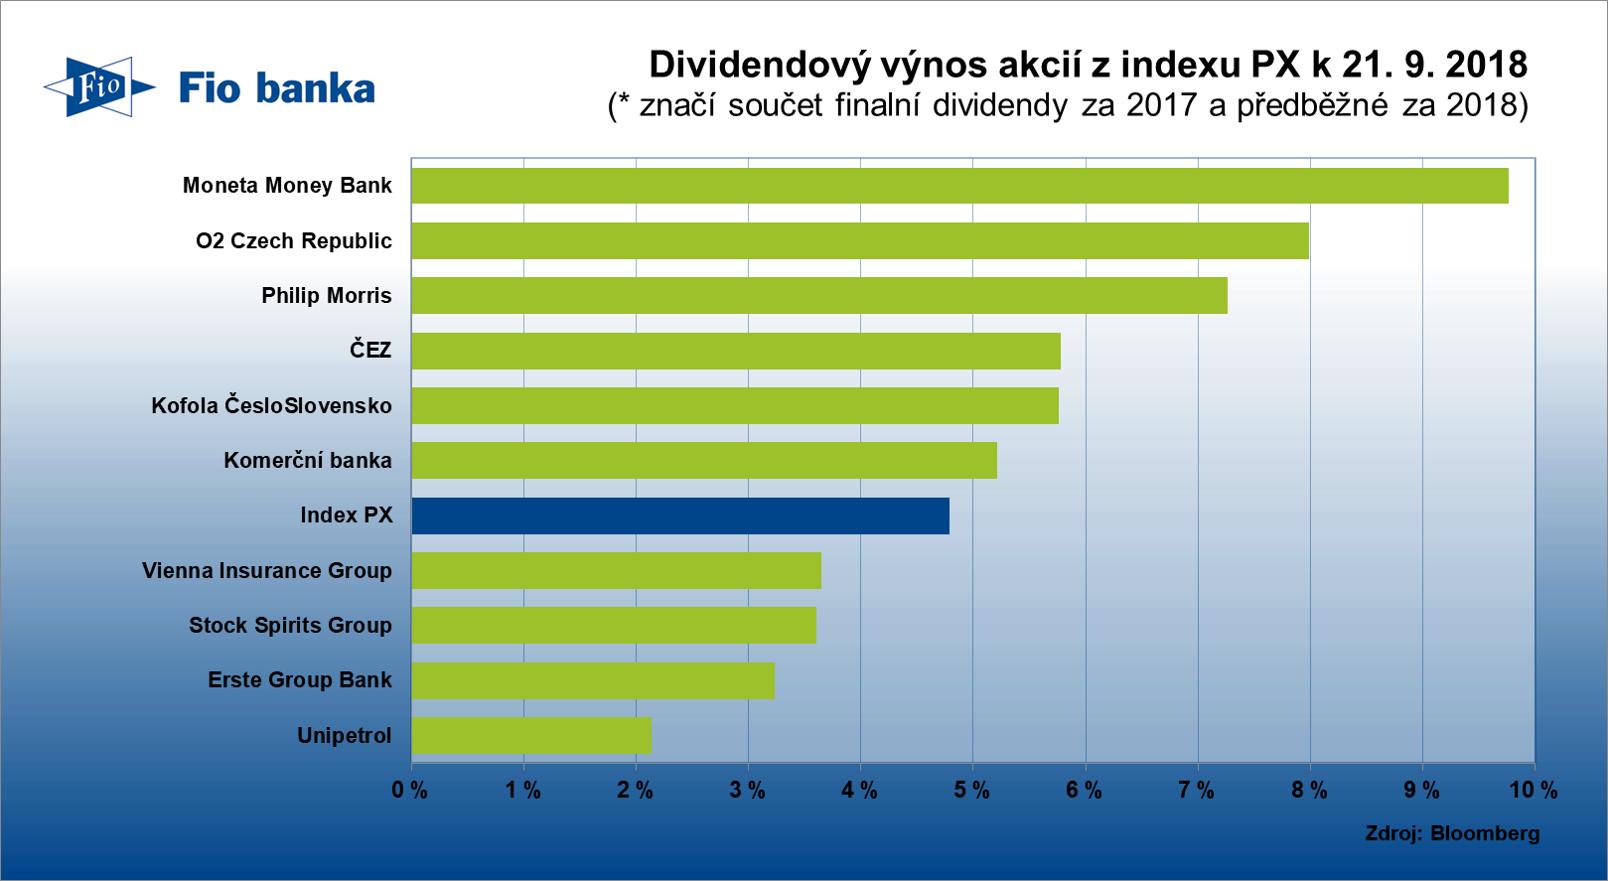 Dividendový výnos českých akcií z indexu PX